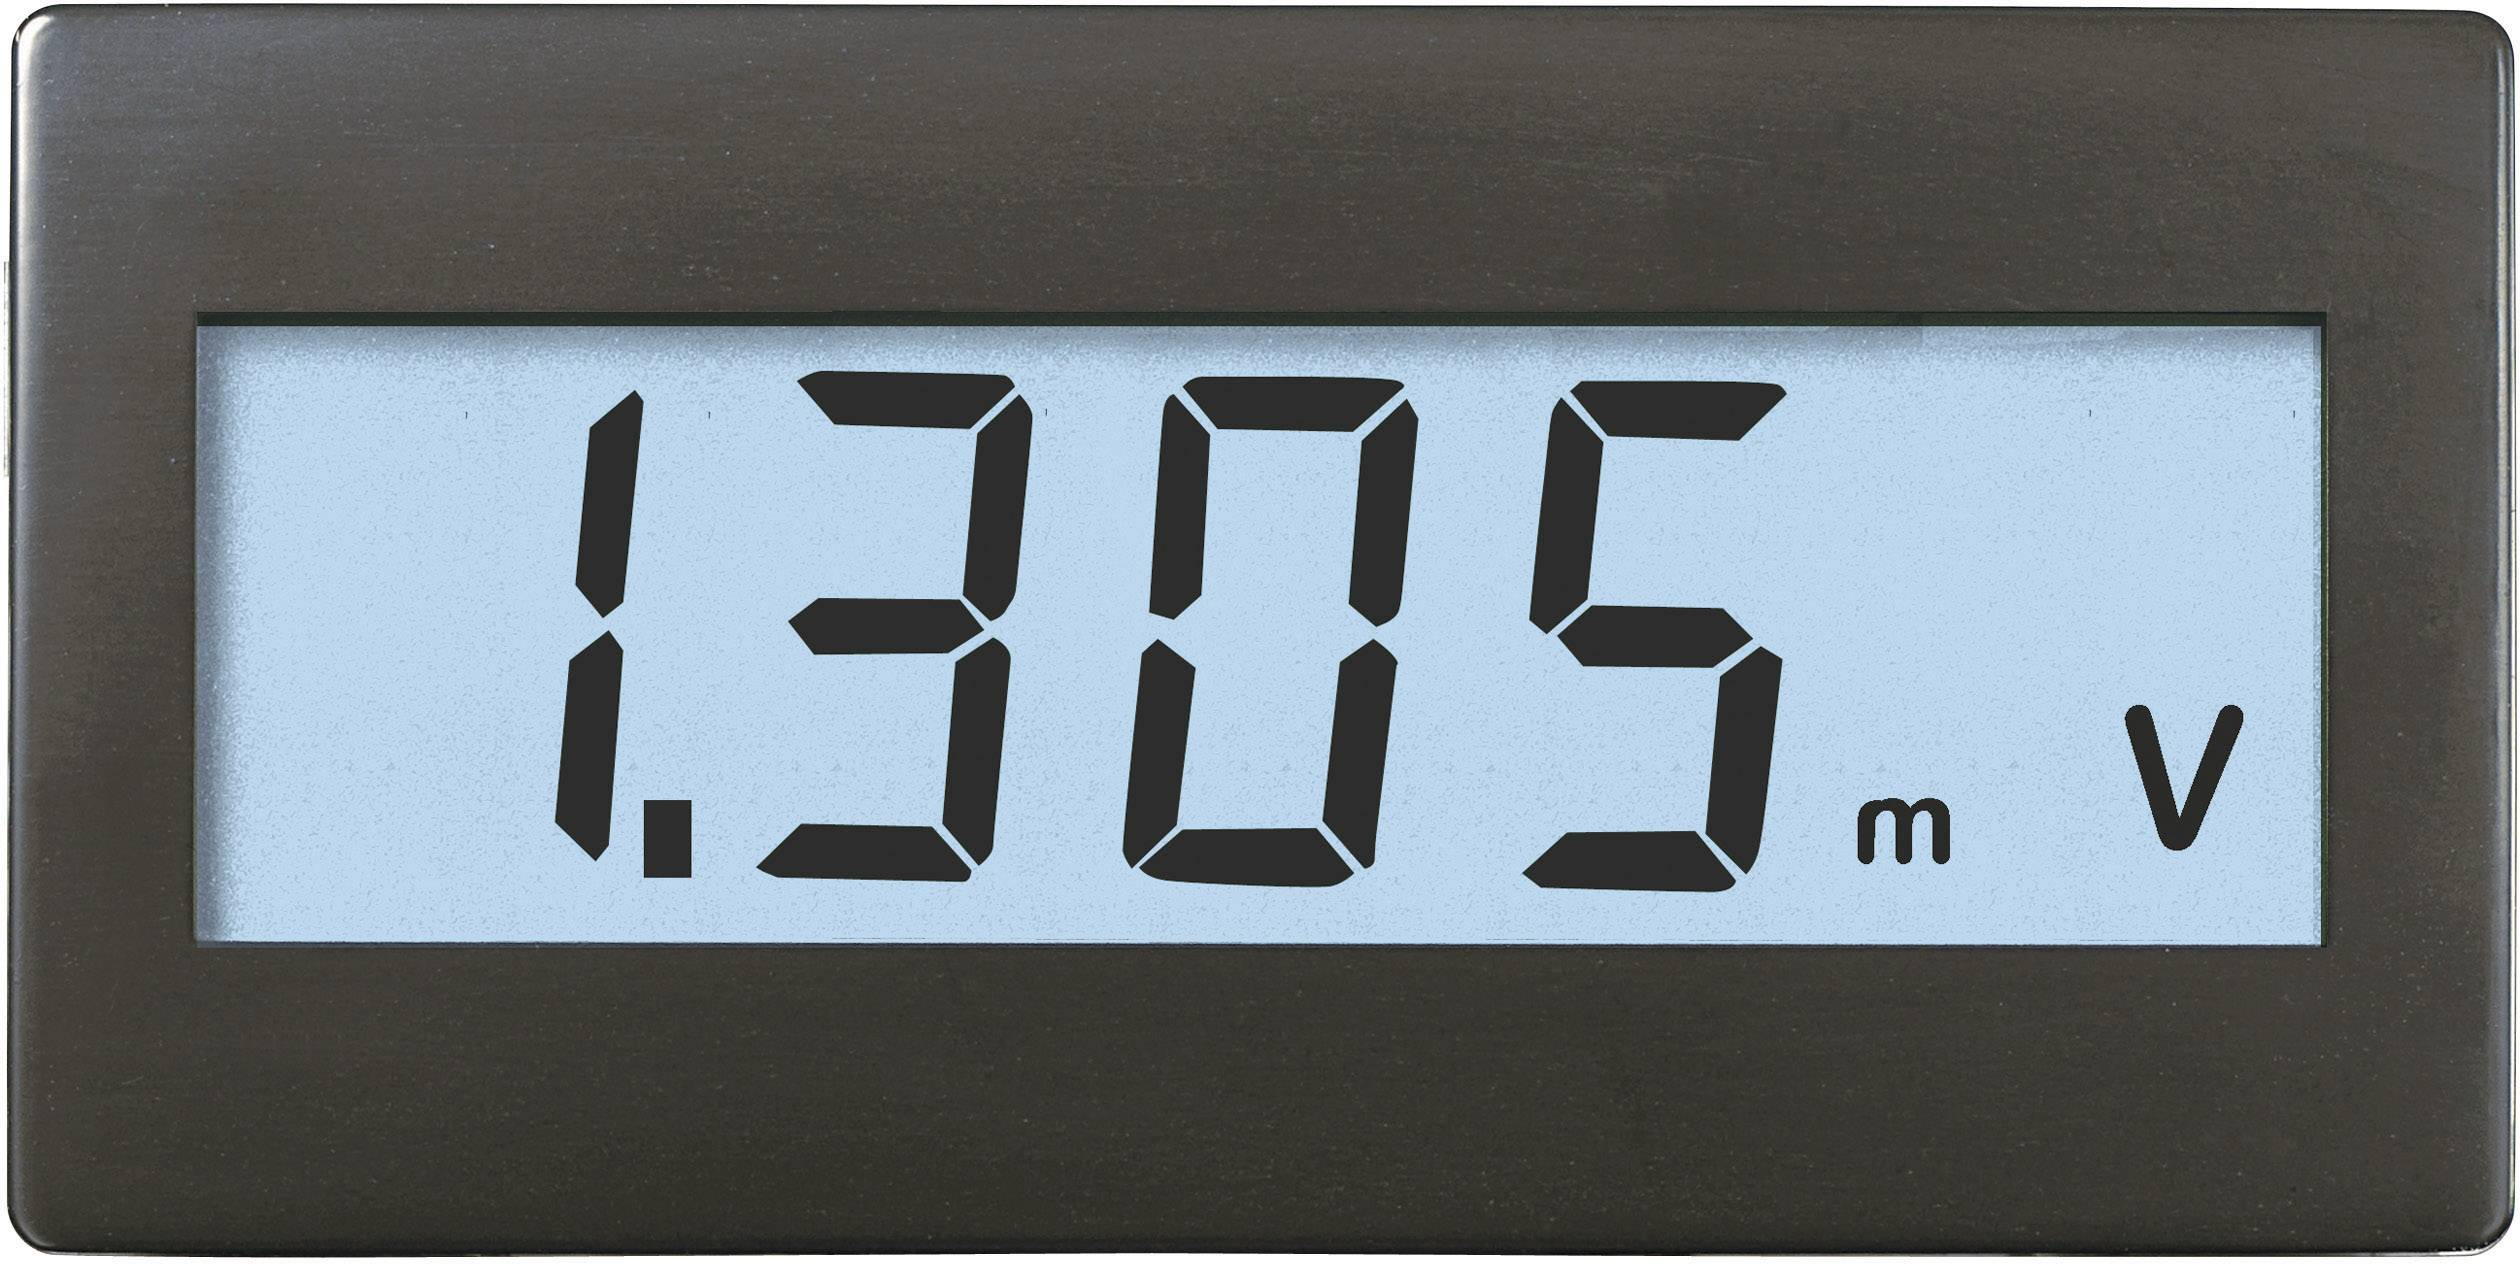 Digitálne panelové meradlo Voltcraft DVM-230W, 45 x 22 mm